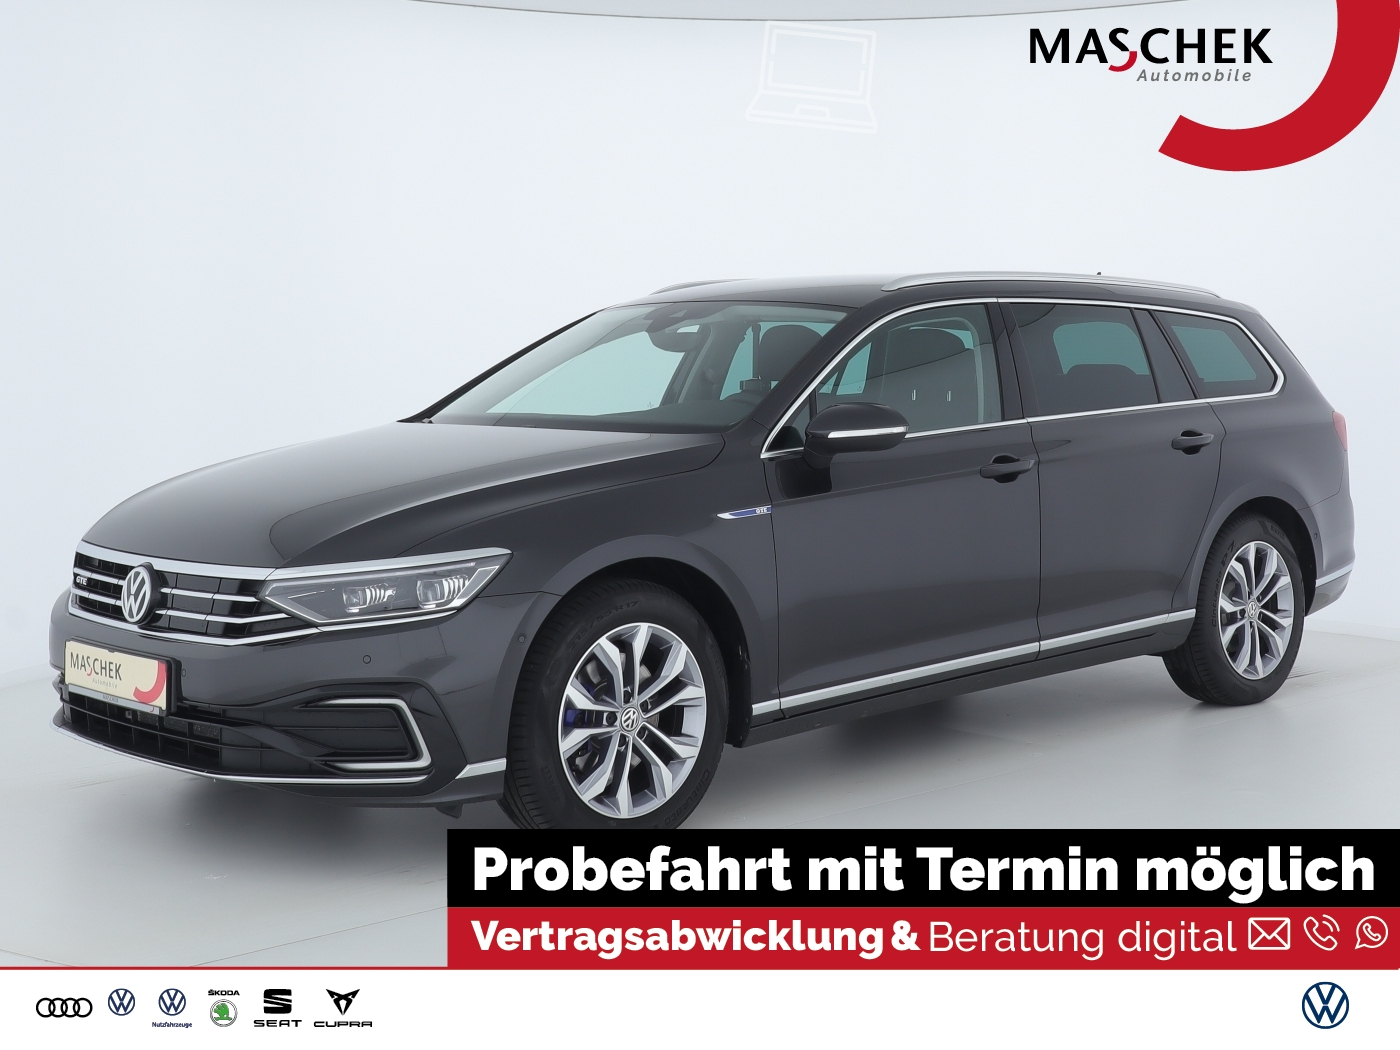 Volkswagen Passat GTE Variant IQ-Light AHK Navi Business e-, Jahr 2019, Hybrid